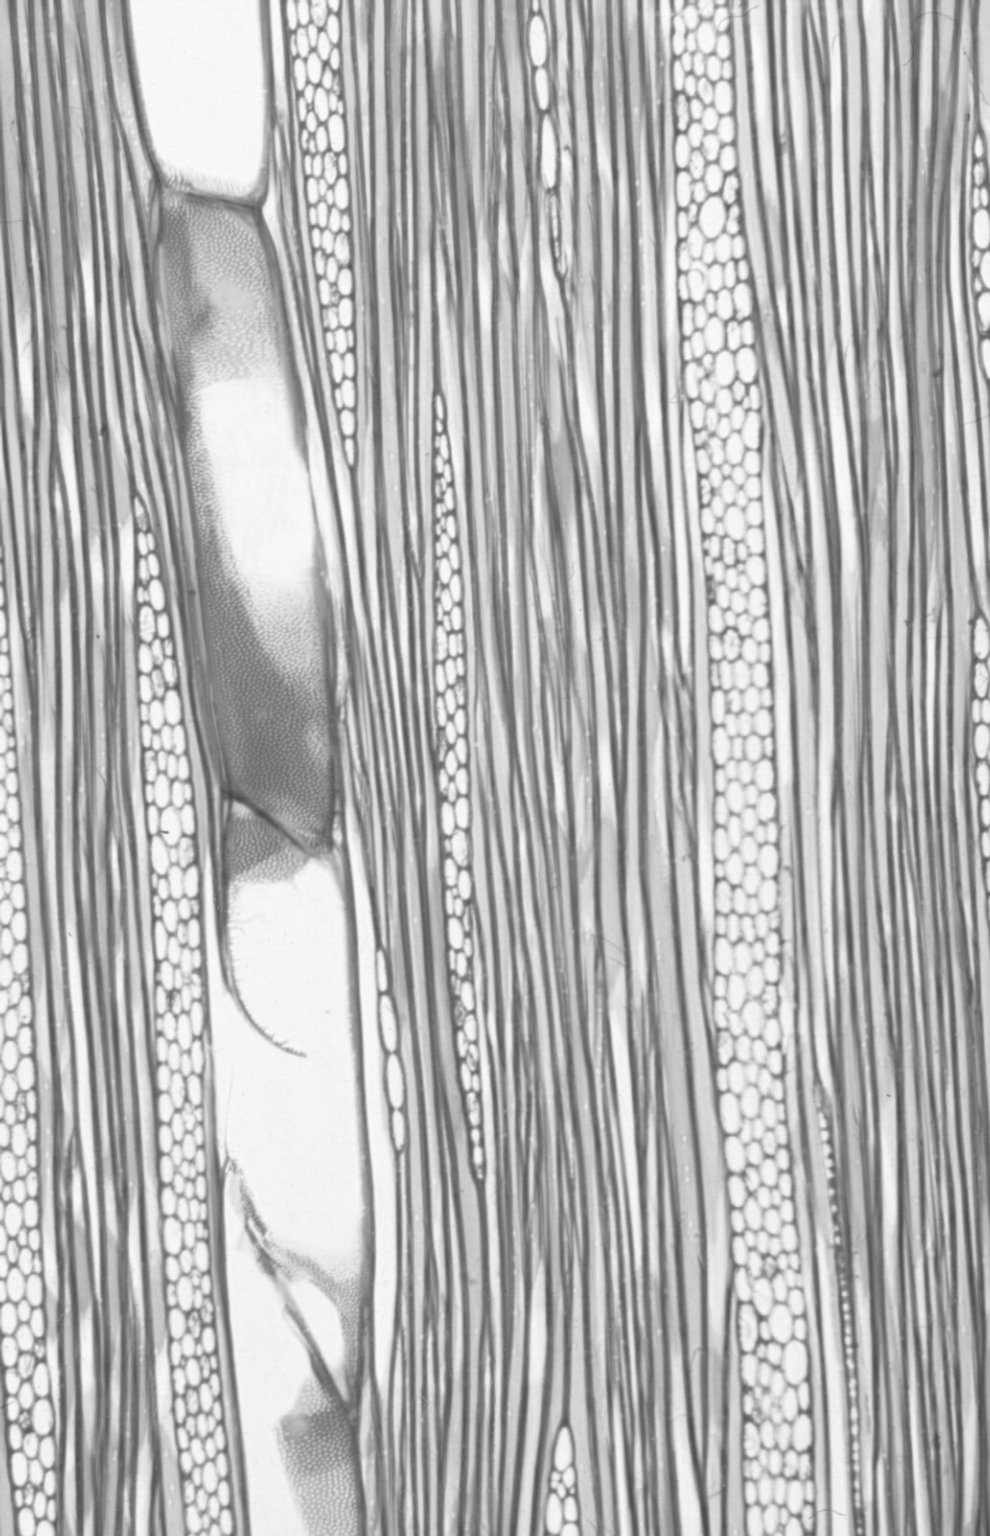 ANNONACEAE Annickia chlorantha